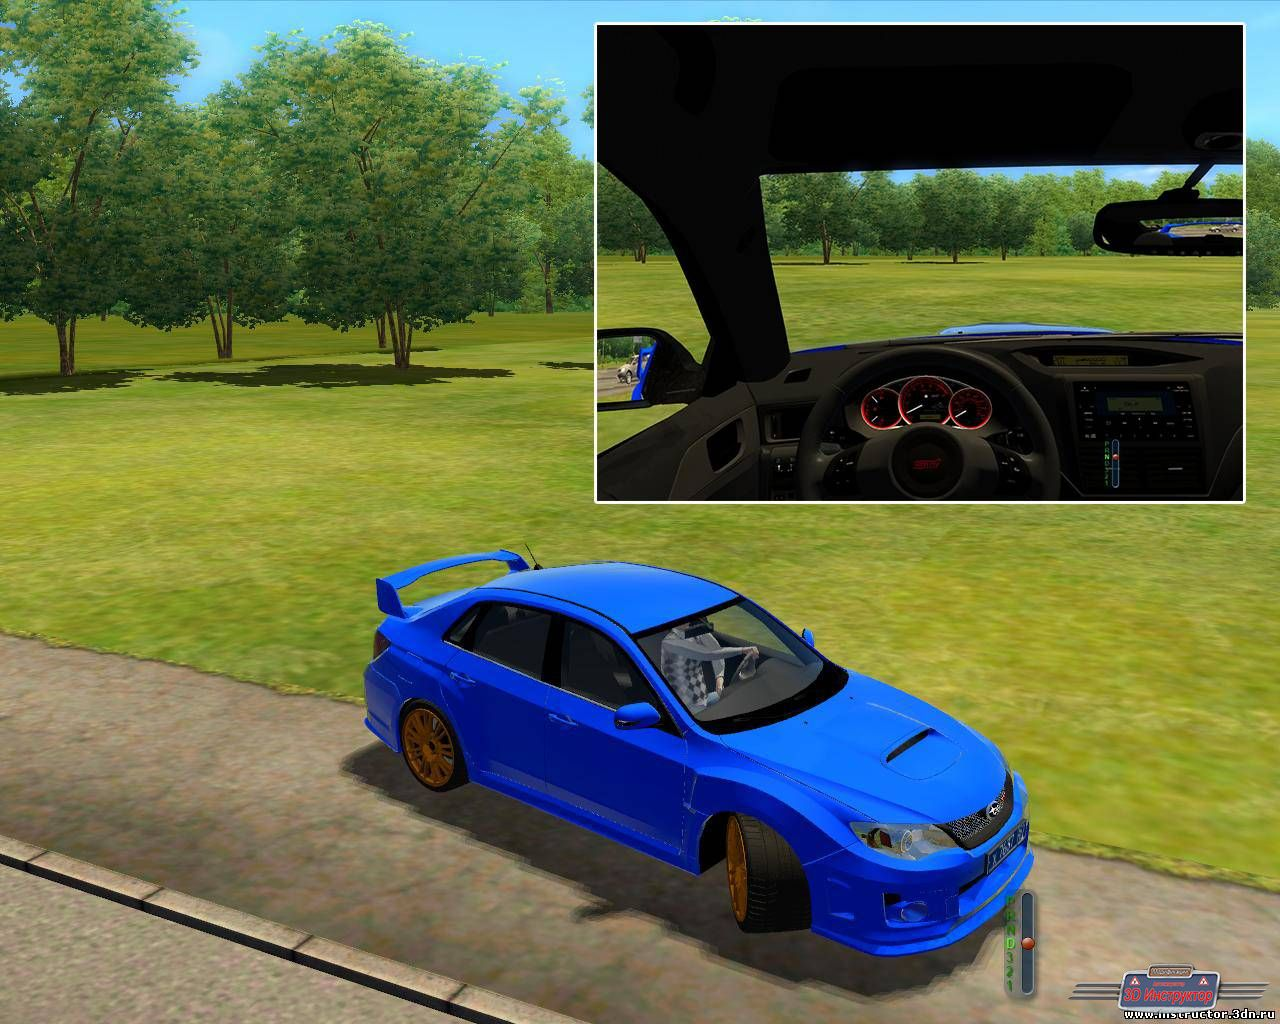 Subaru Impreza WRX STI 2011 для 3D Инструктор [2.2.7]